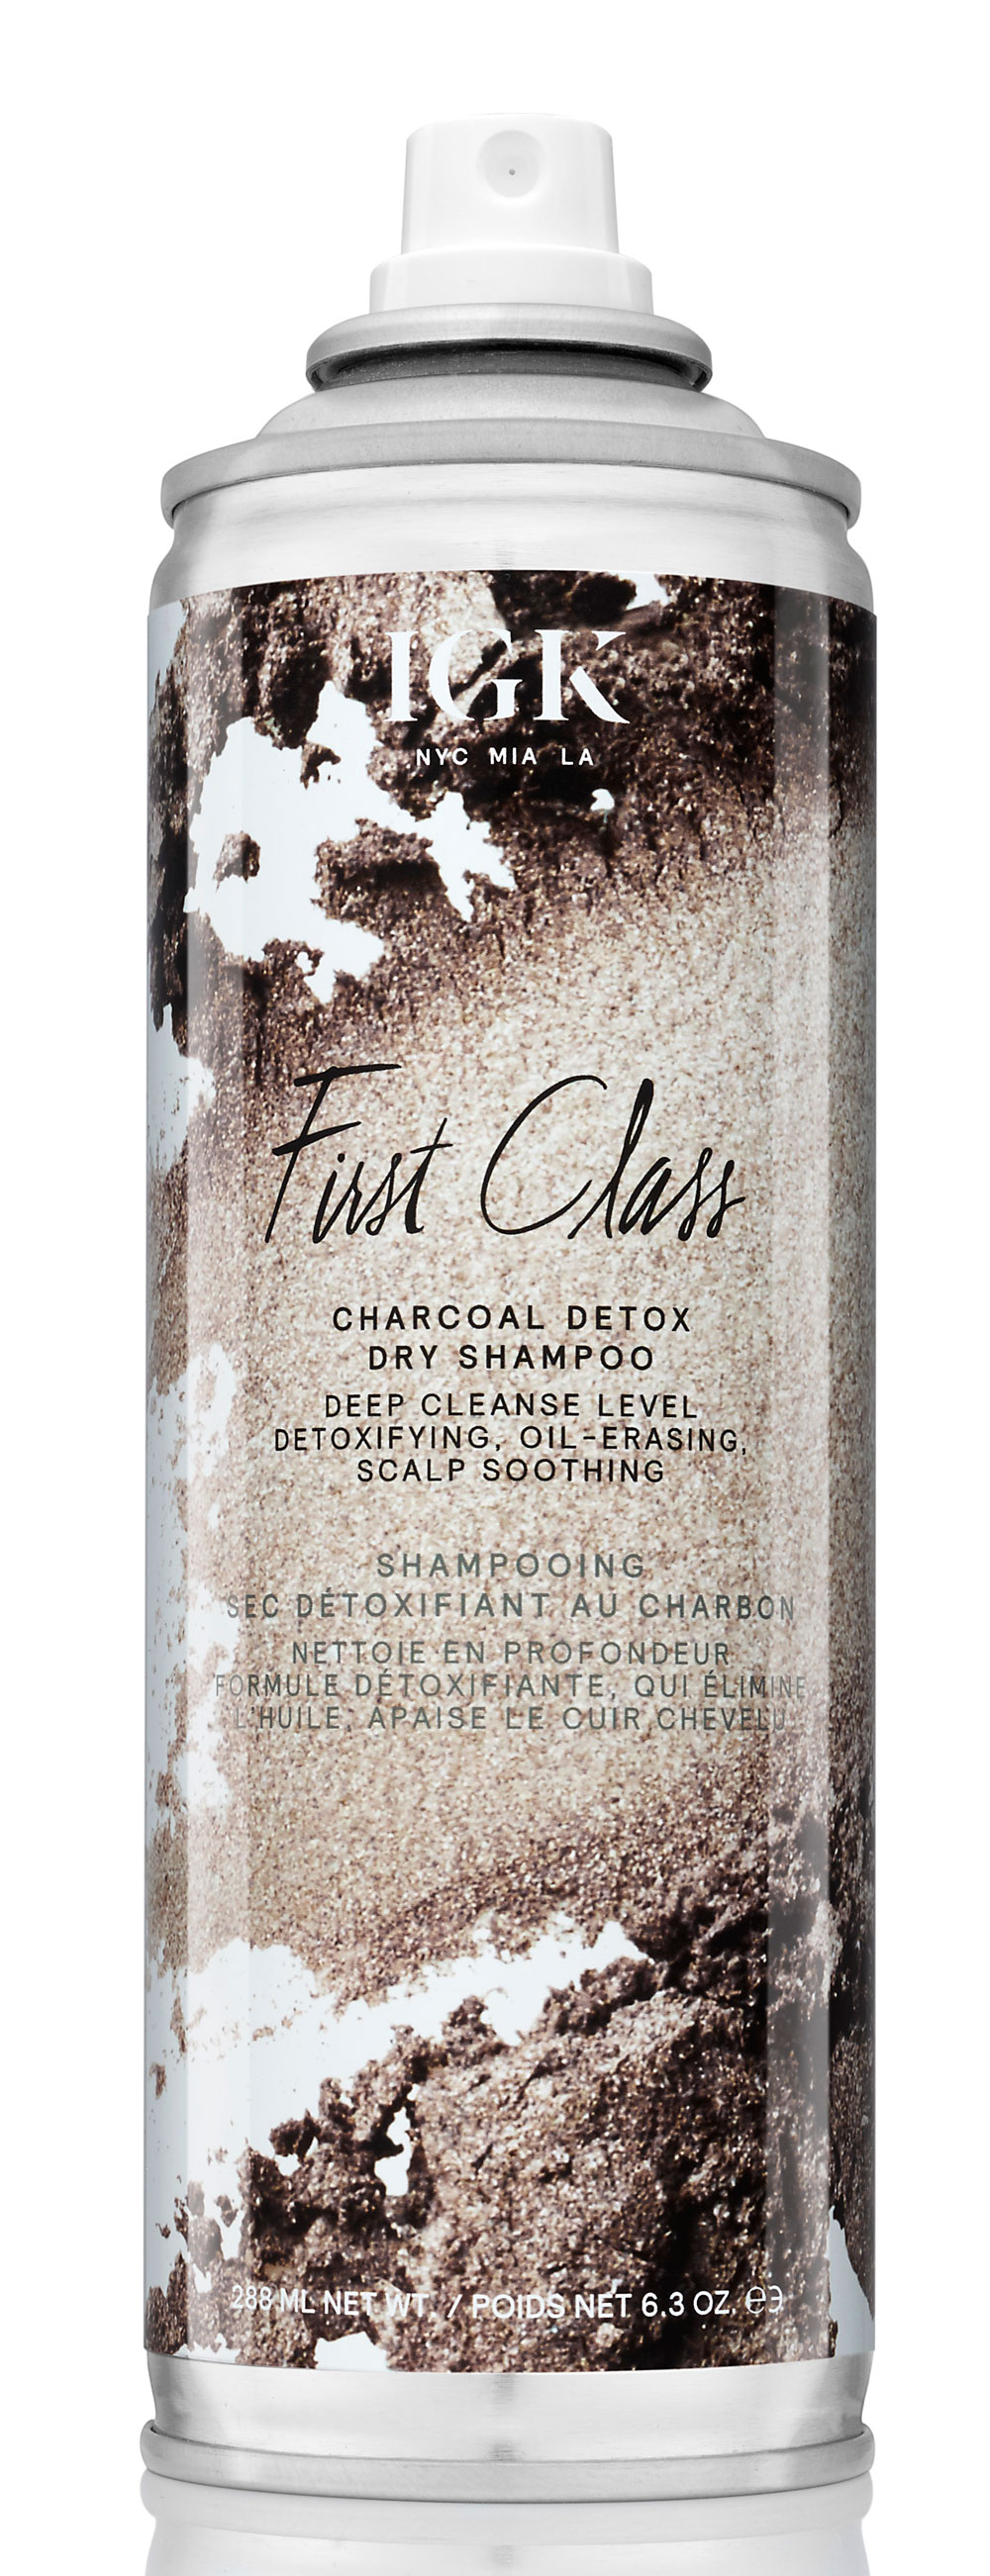 IGK FIRST CLASS Dry Shampoo